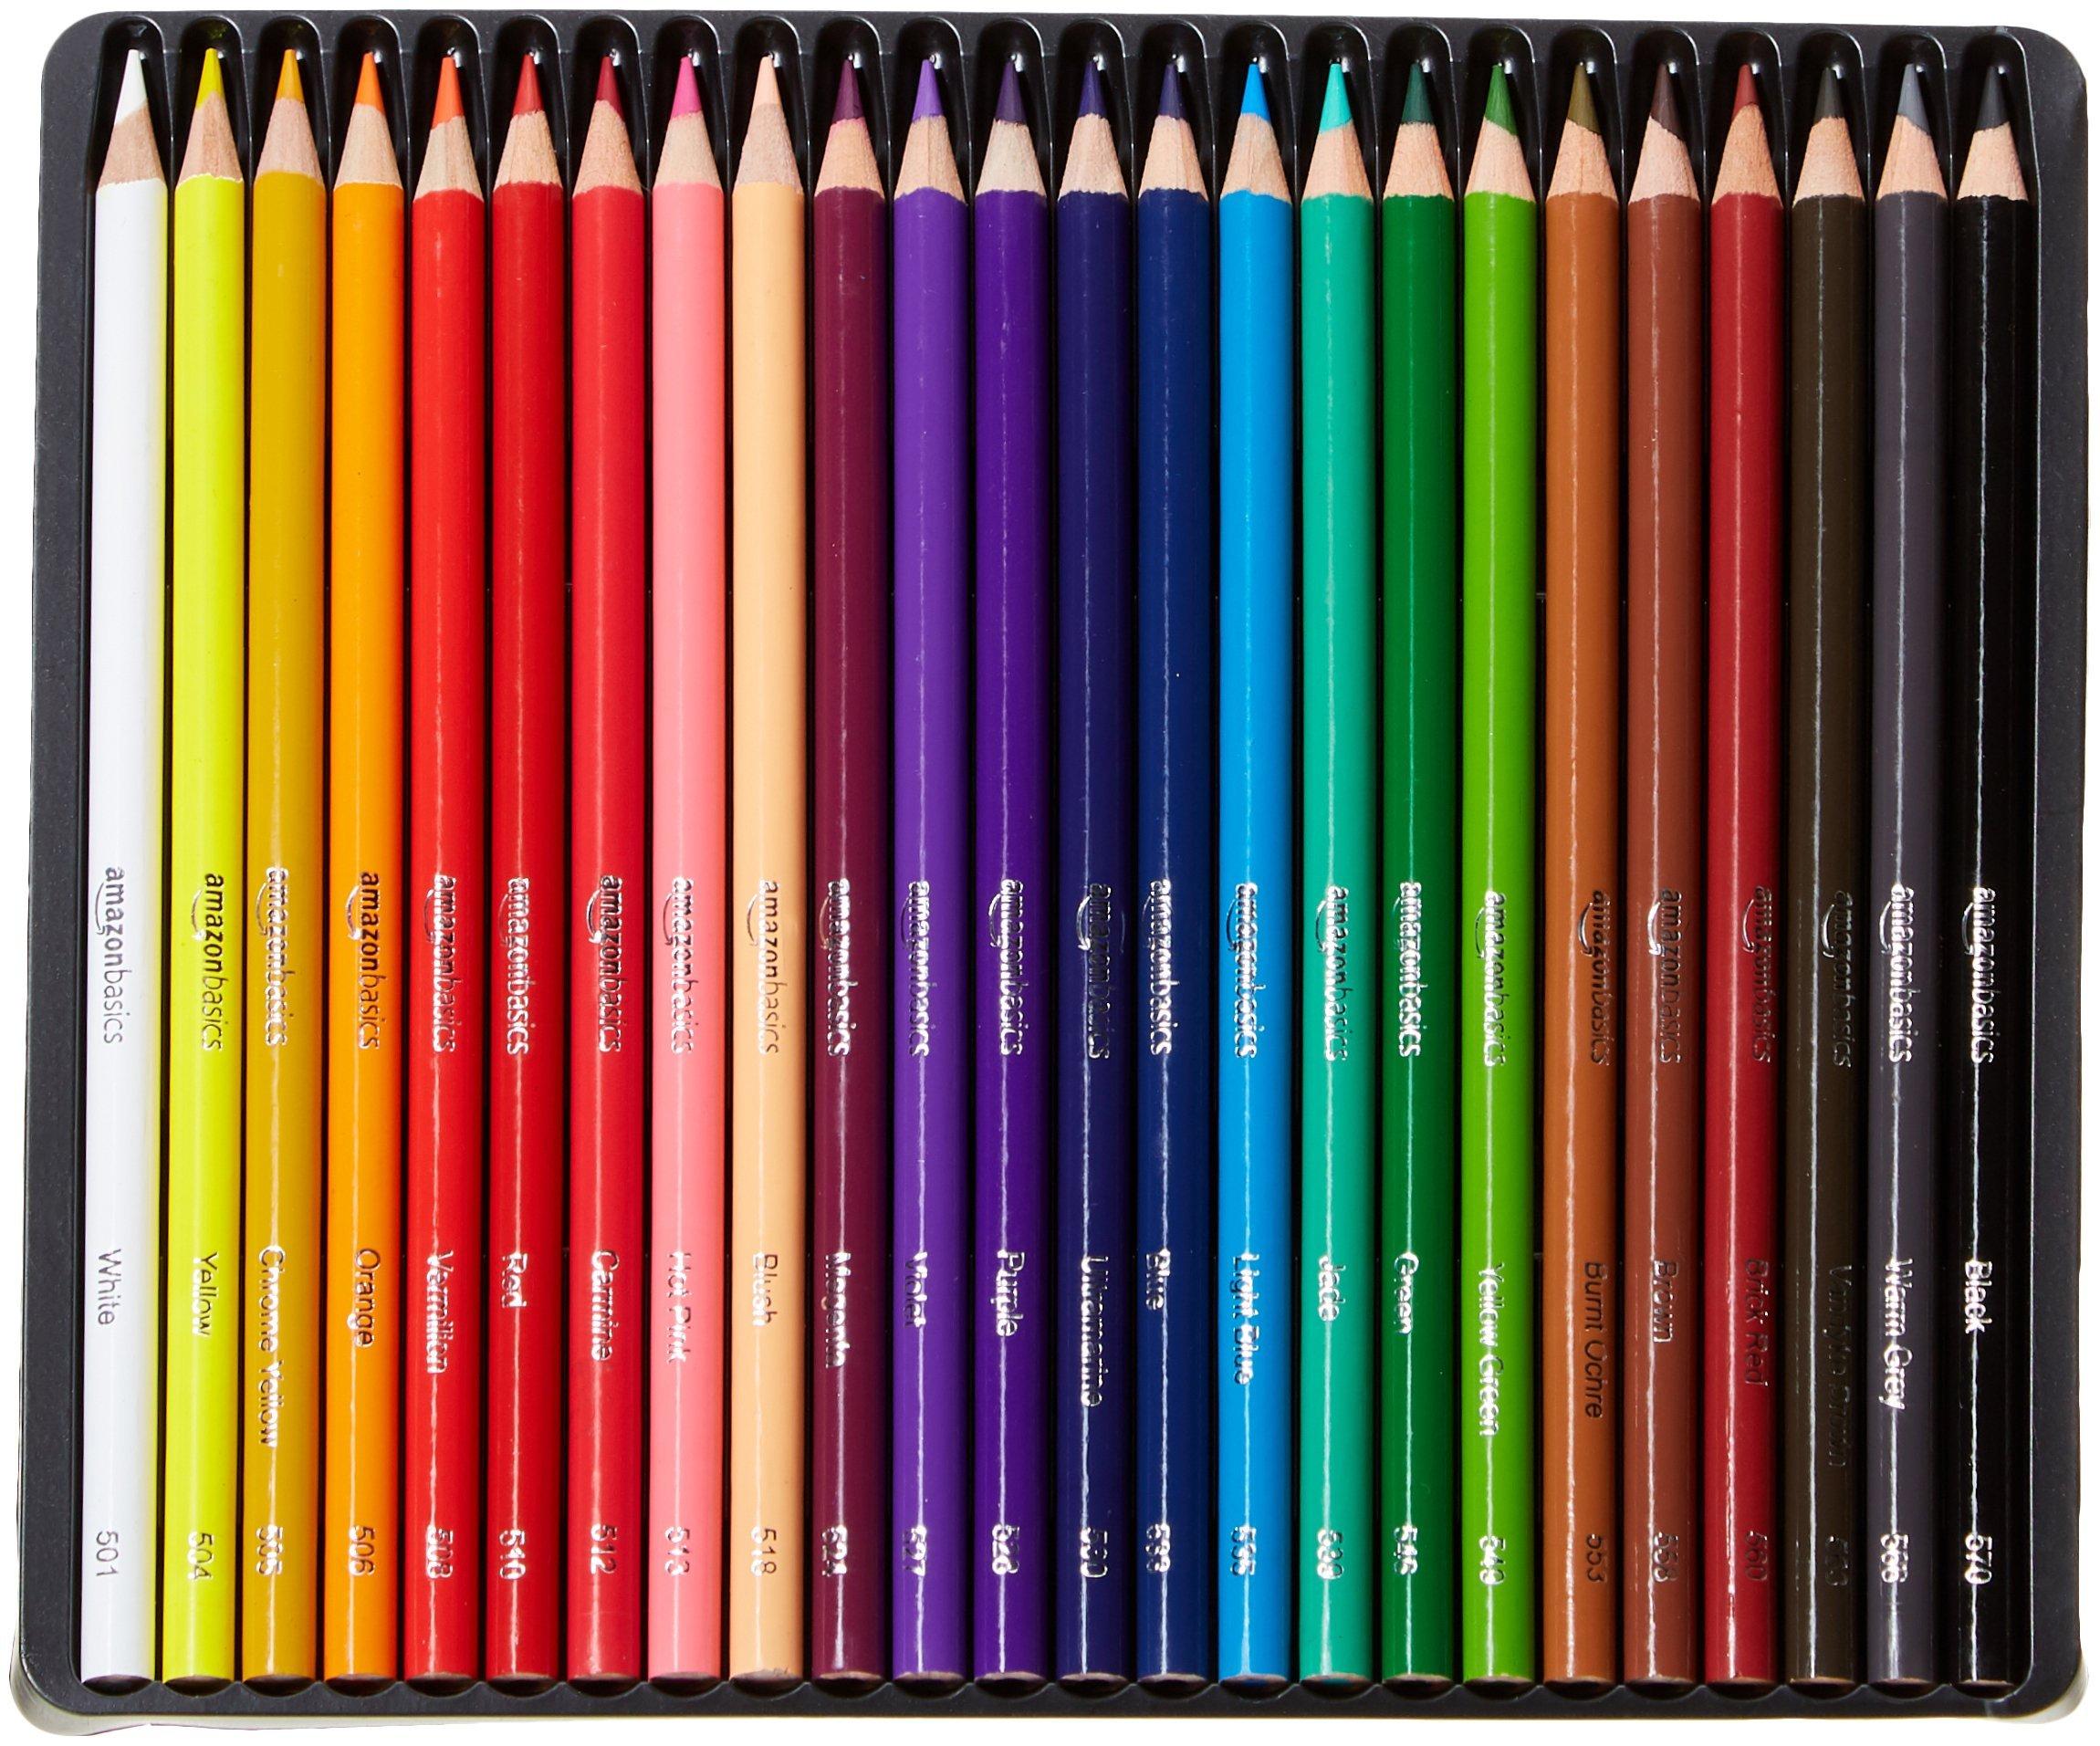 AmazonBasics Colored Pencils - 24-Count by AmazonBasics (Image #3)